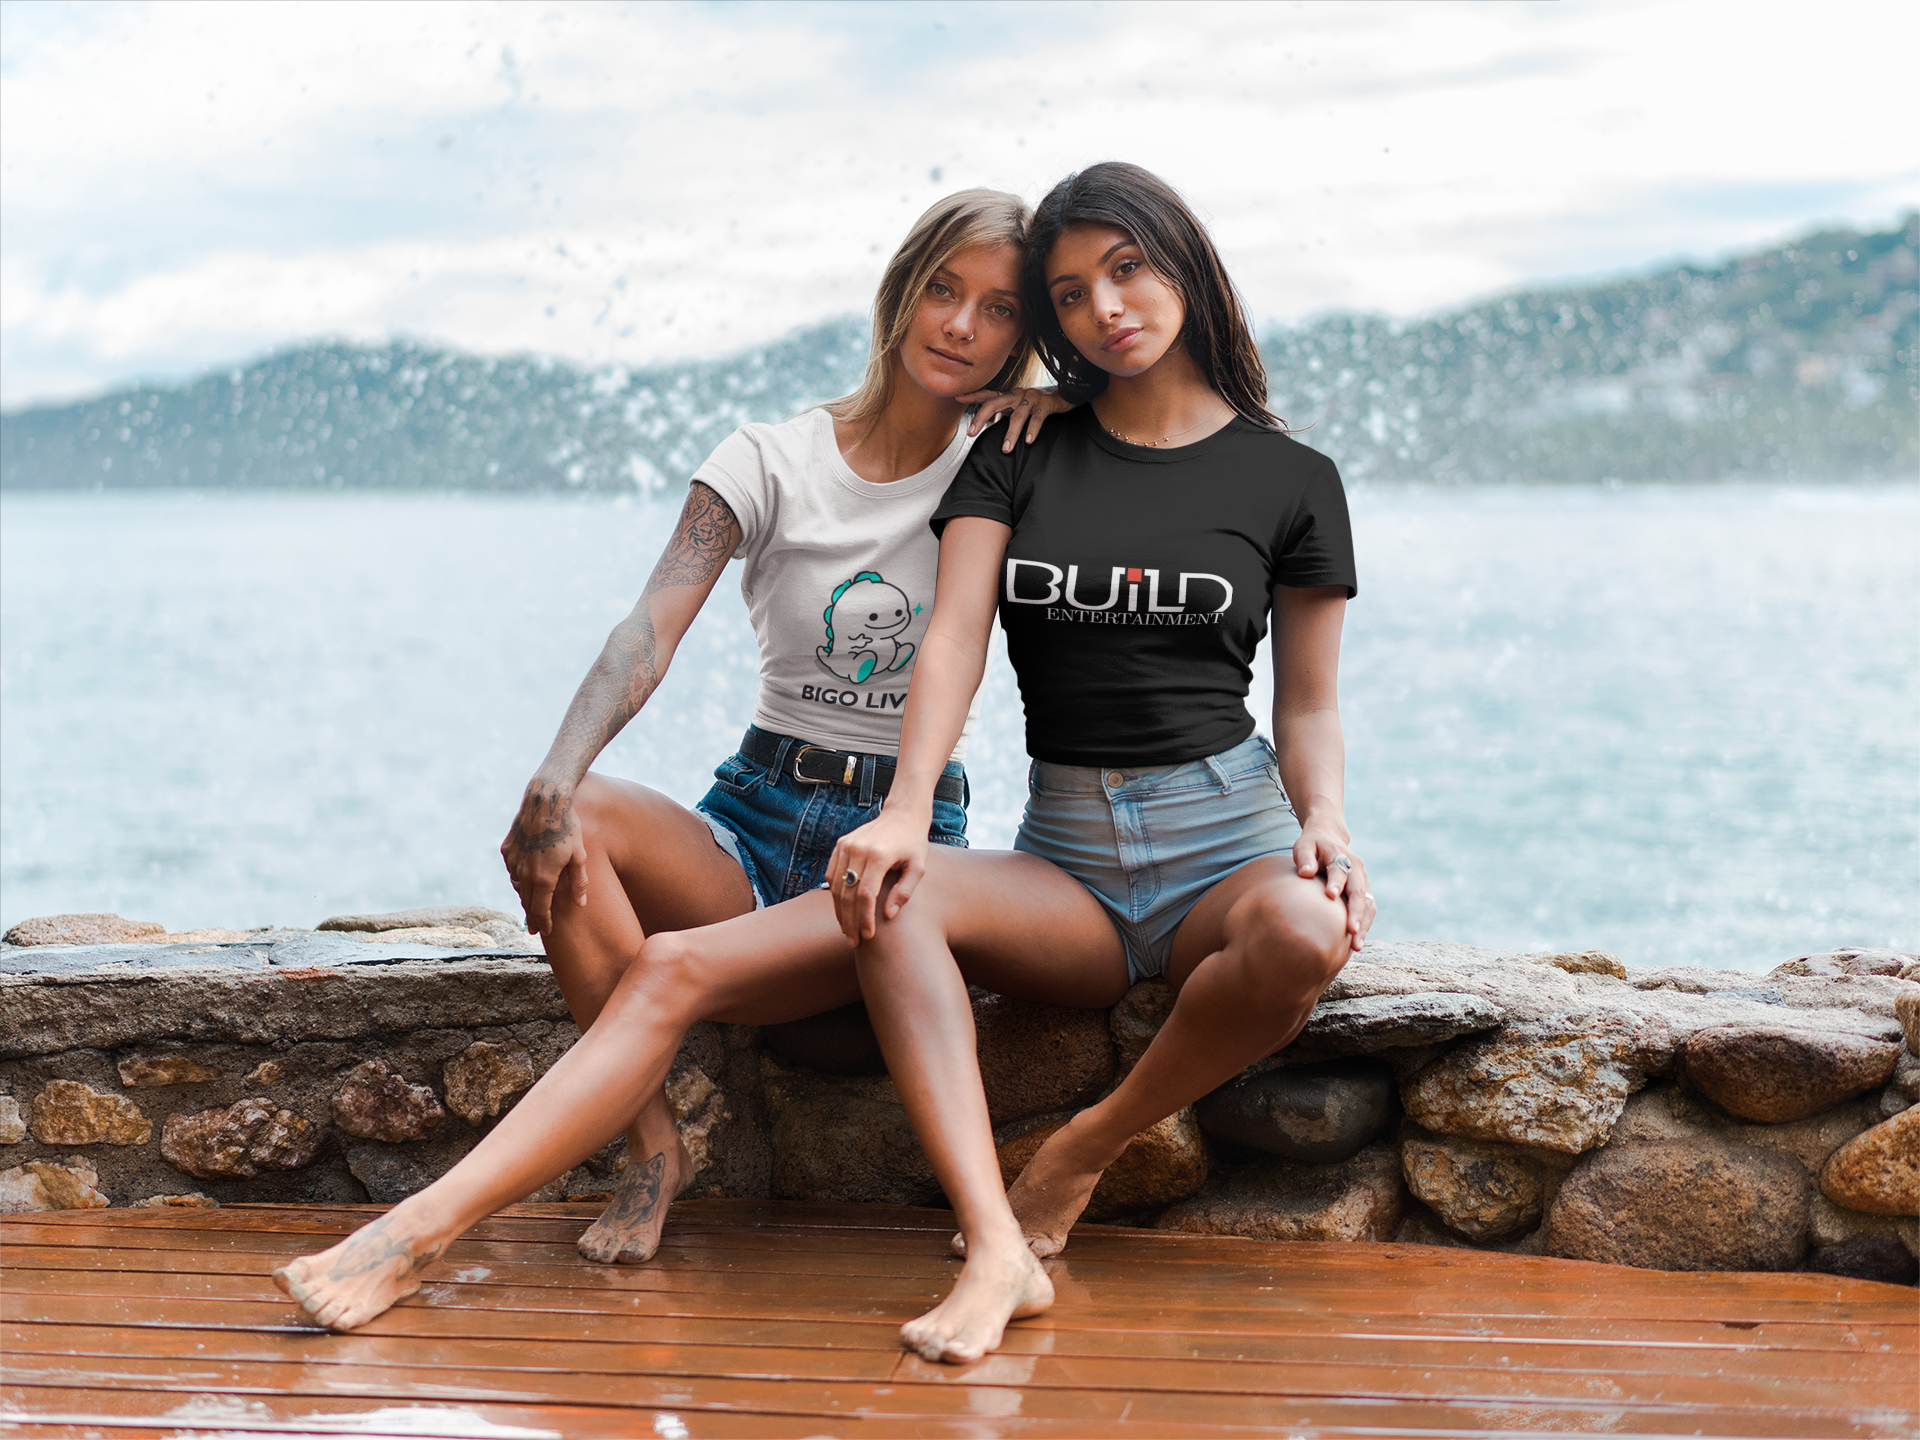 girlfriends-wearing-t-shirts-mockup-sitt